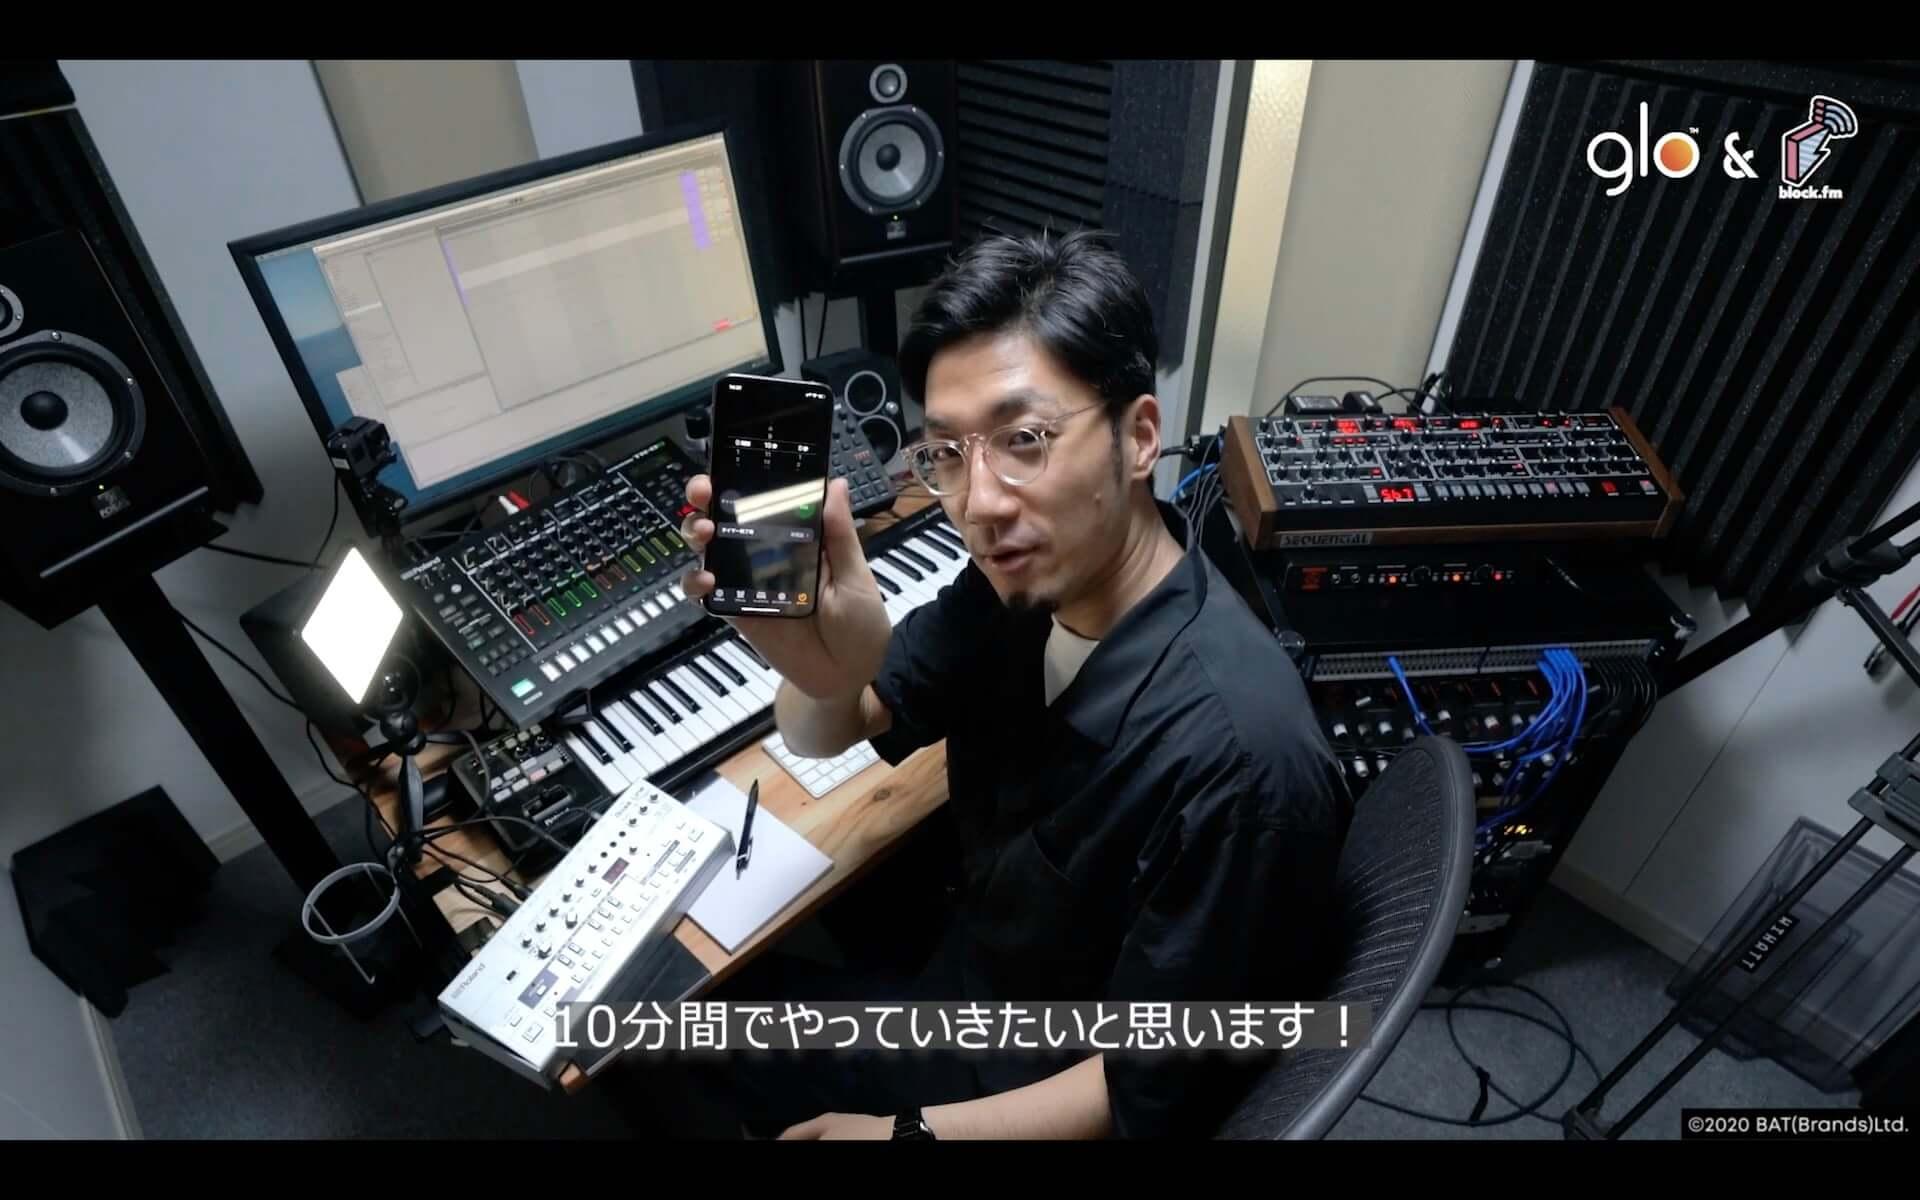 Seiho、tofubeats、Yamato、☆Taku Takahashiが様々なお題に挑戦!glo™とblock.fmが贈る動画シリーズが公開 music200916_glo-blockfm_5-1920x1200